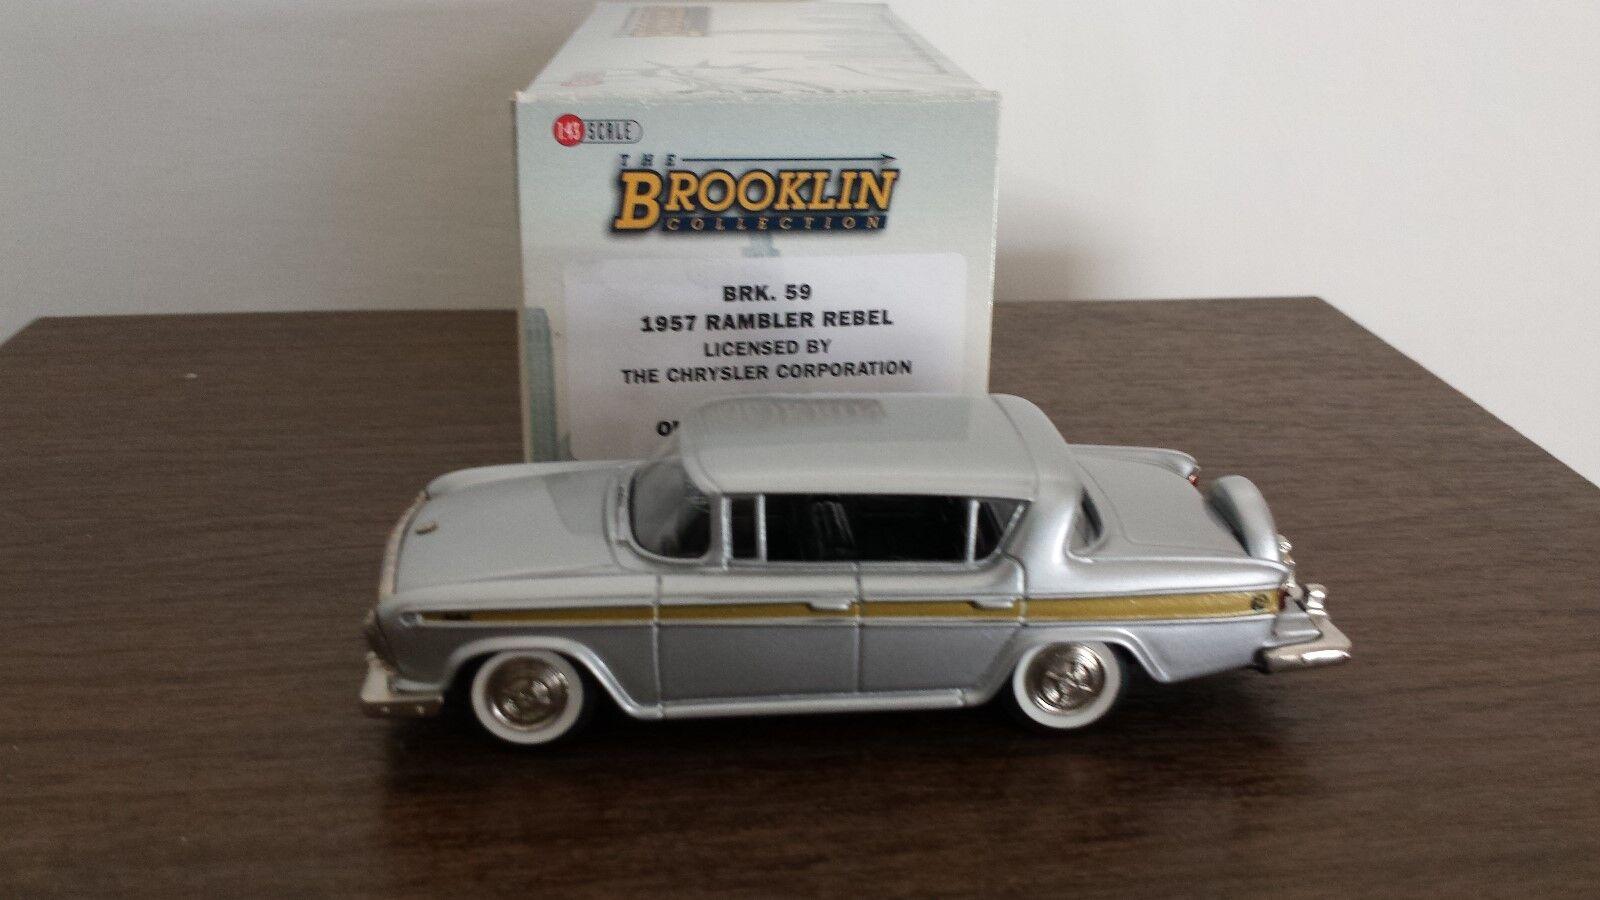 Brooklin models Rambler Rebel 1957 1957 1957  BRK 59 1:43 f80f4f